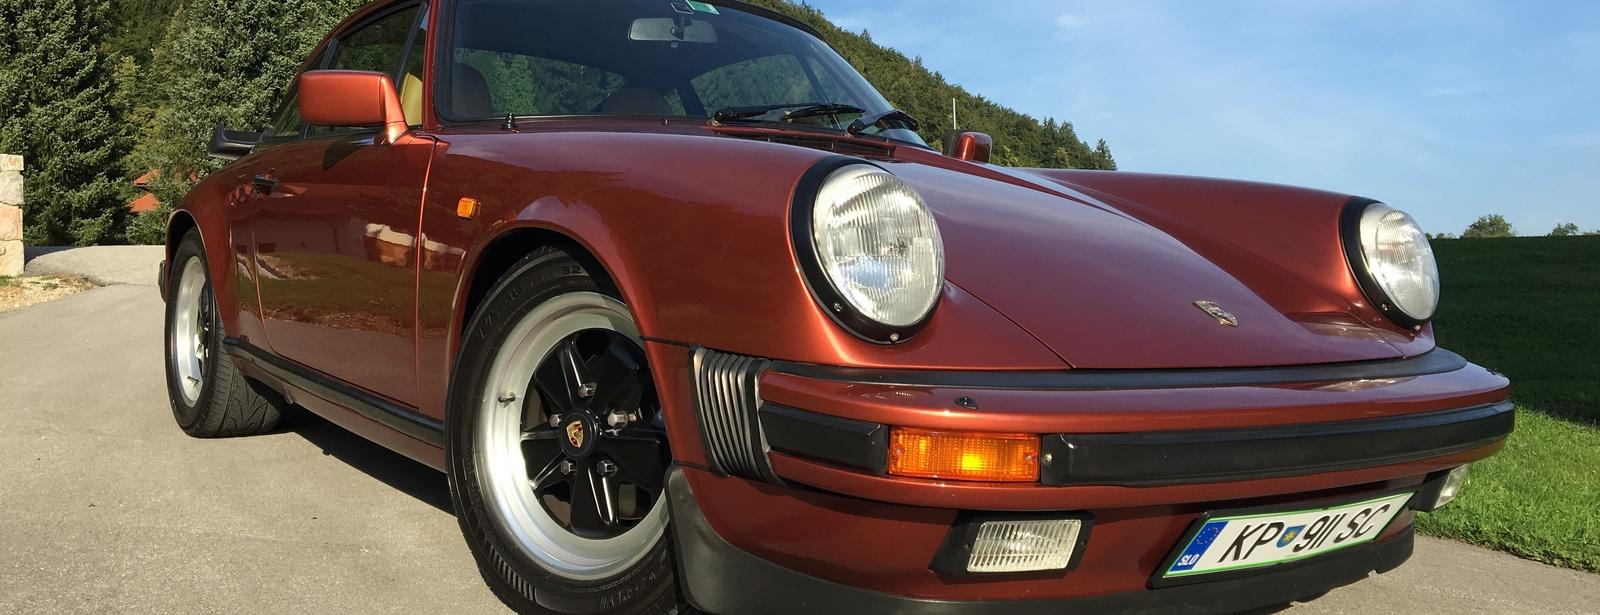 911 Sc Avtomobili Clanov Porsche Klub Slovenija